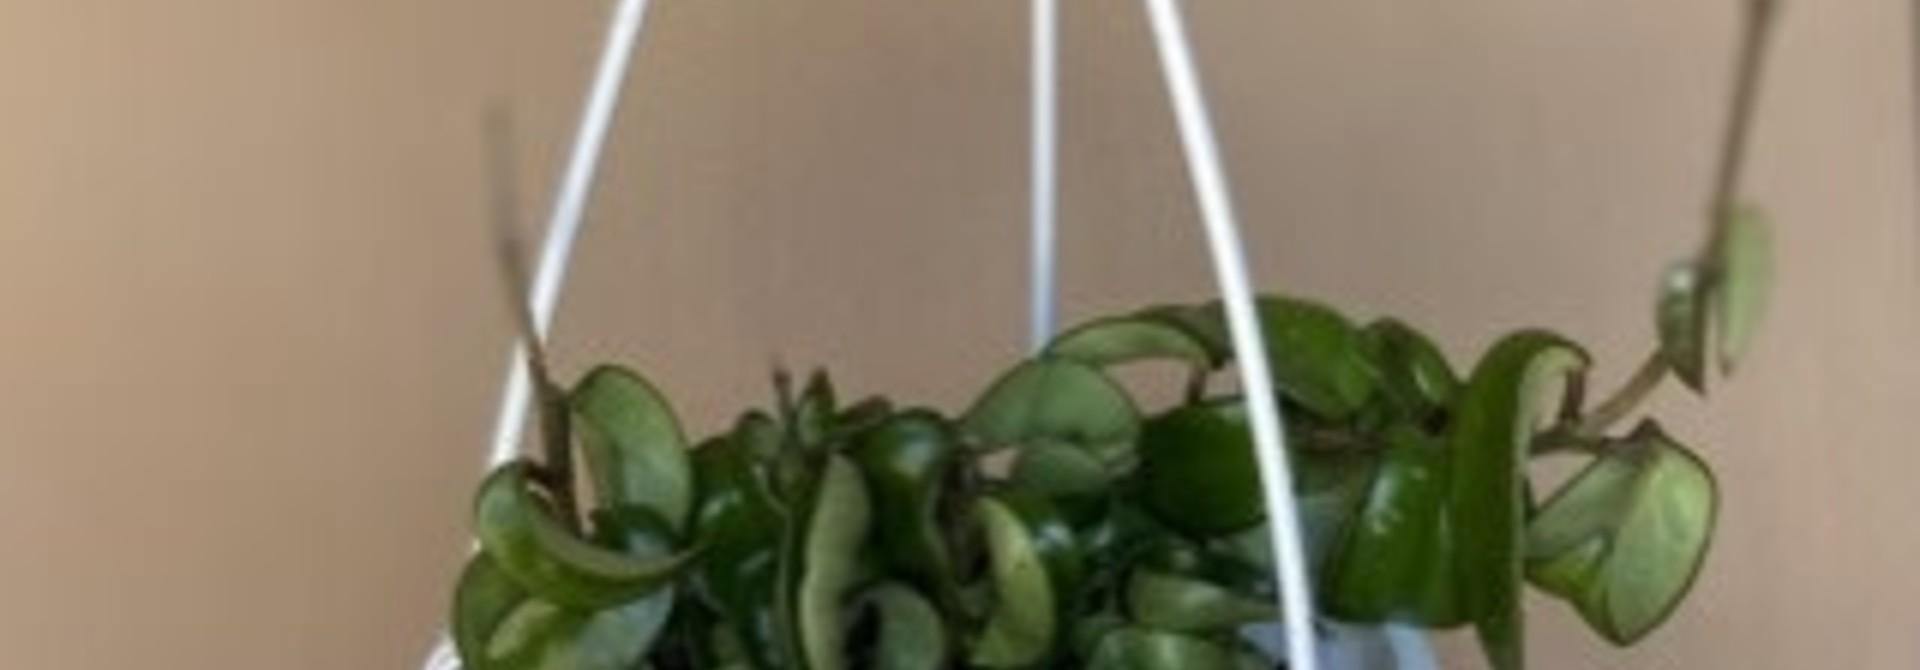 Hoya carnosa « Compacta » 6po PS